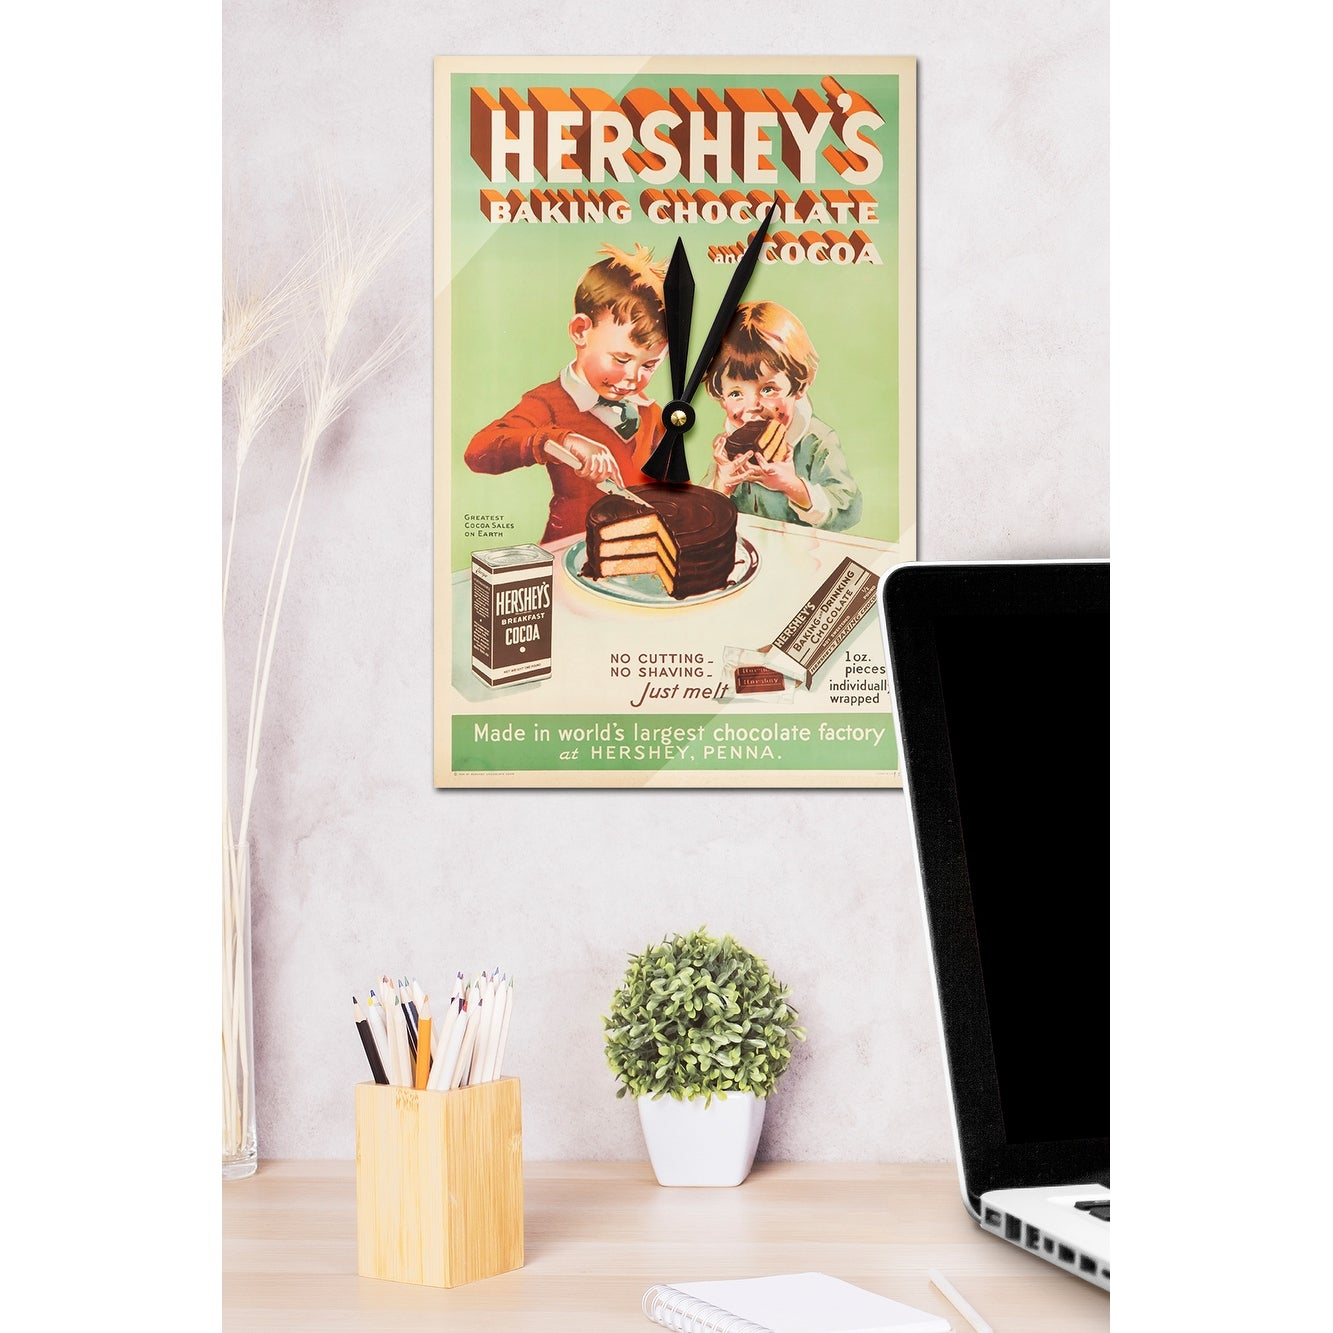 Hersheys Baking Chocolate & Cocoa 1934 Vintage Ad (Acrylic Wall Clock) -  acrylic wall clock